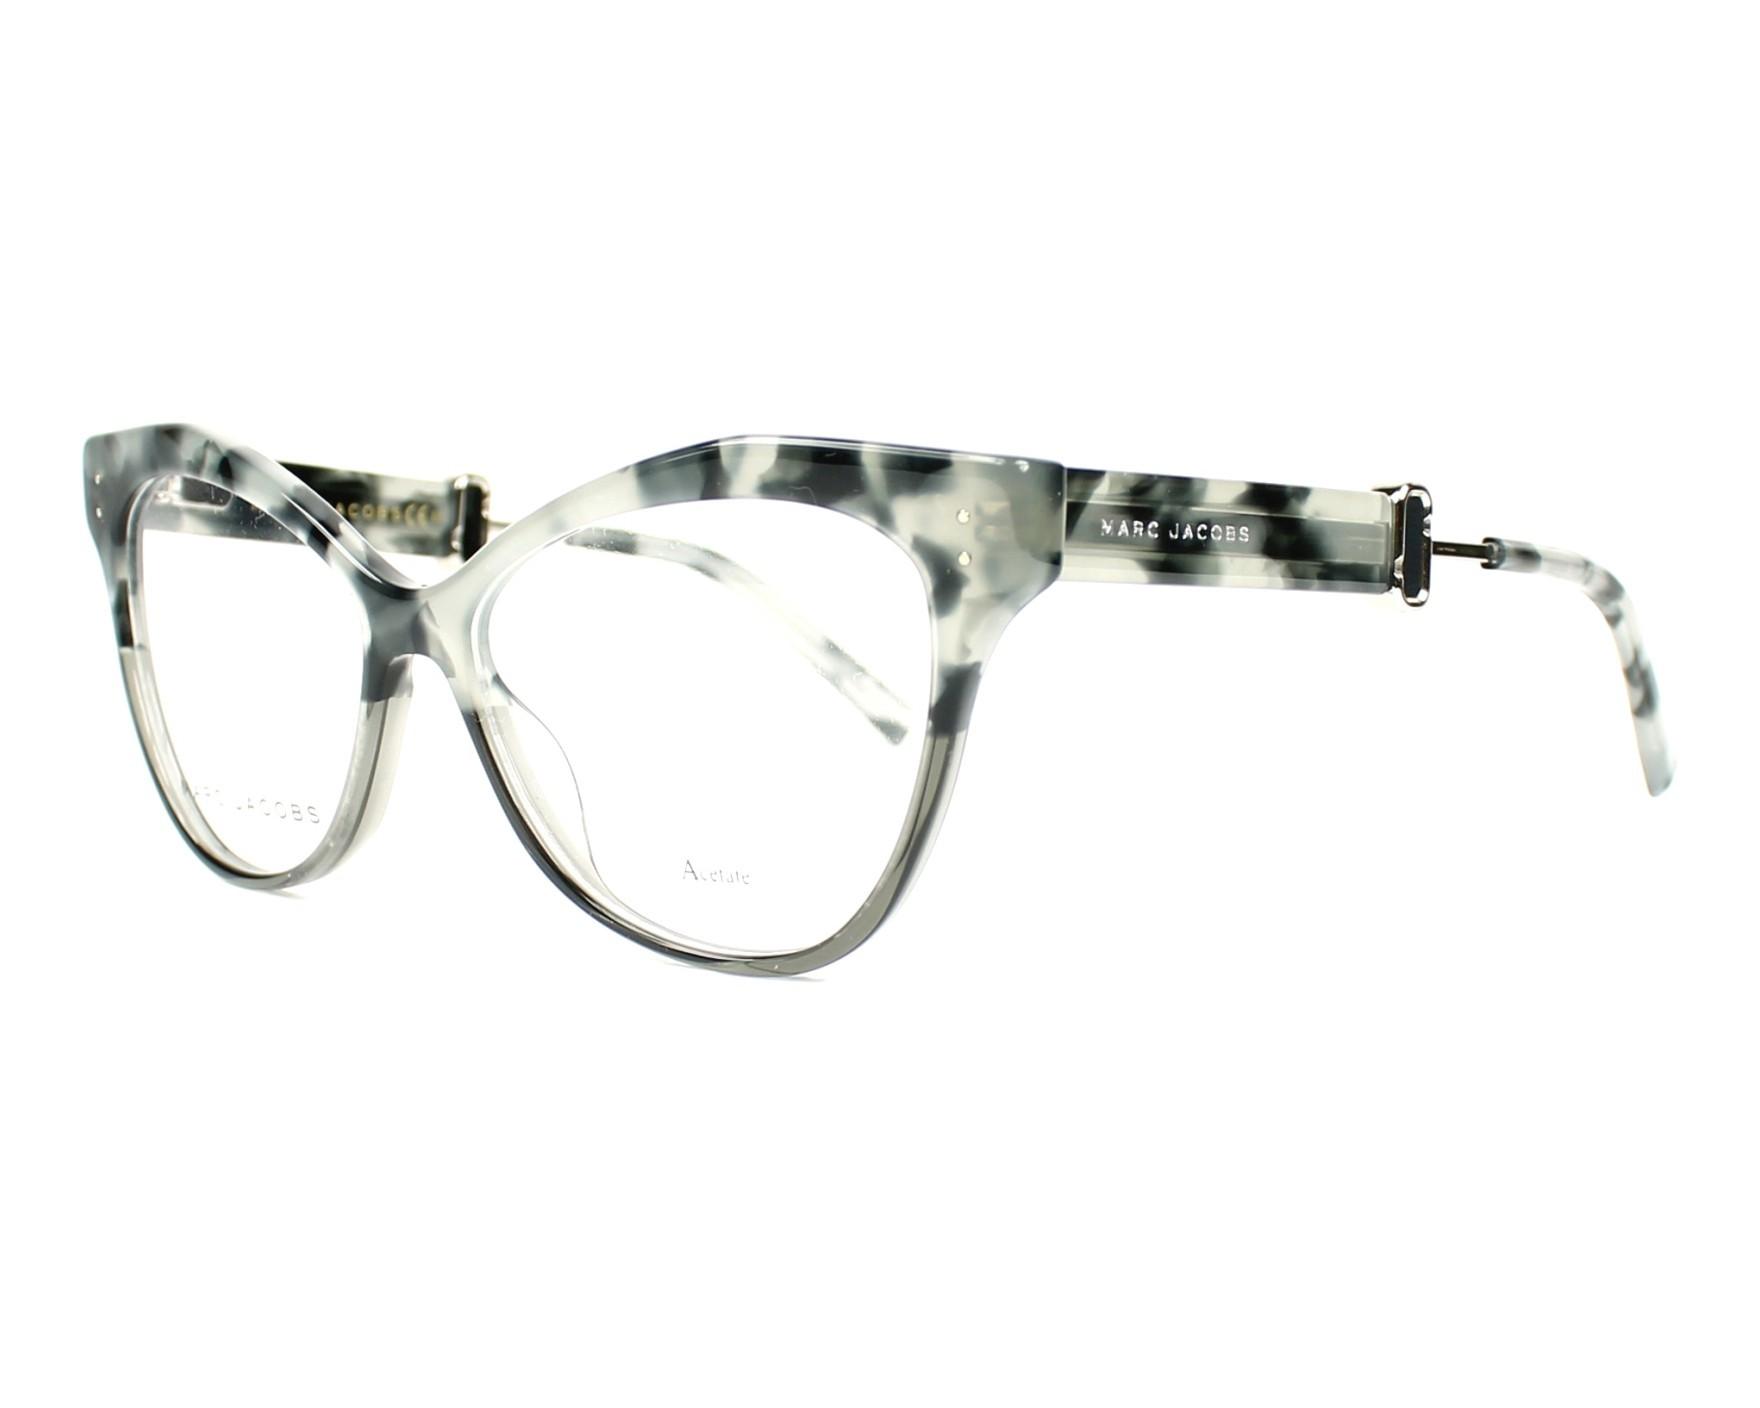 Marc Jacobs Brille MARC-133 P30 Marmor - Gläser: